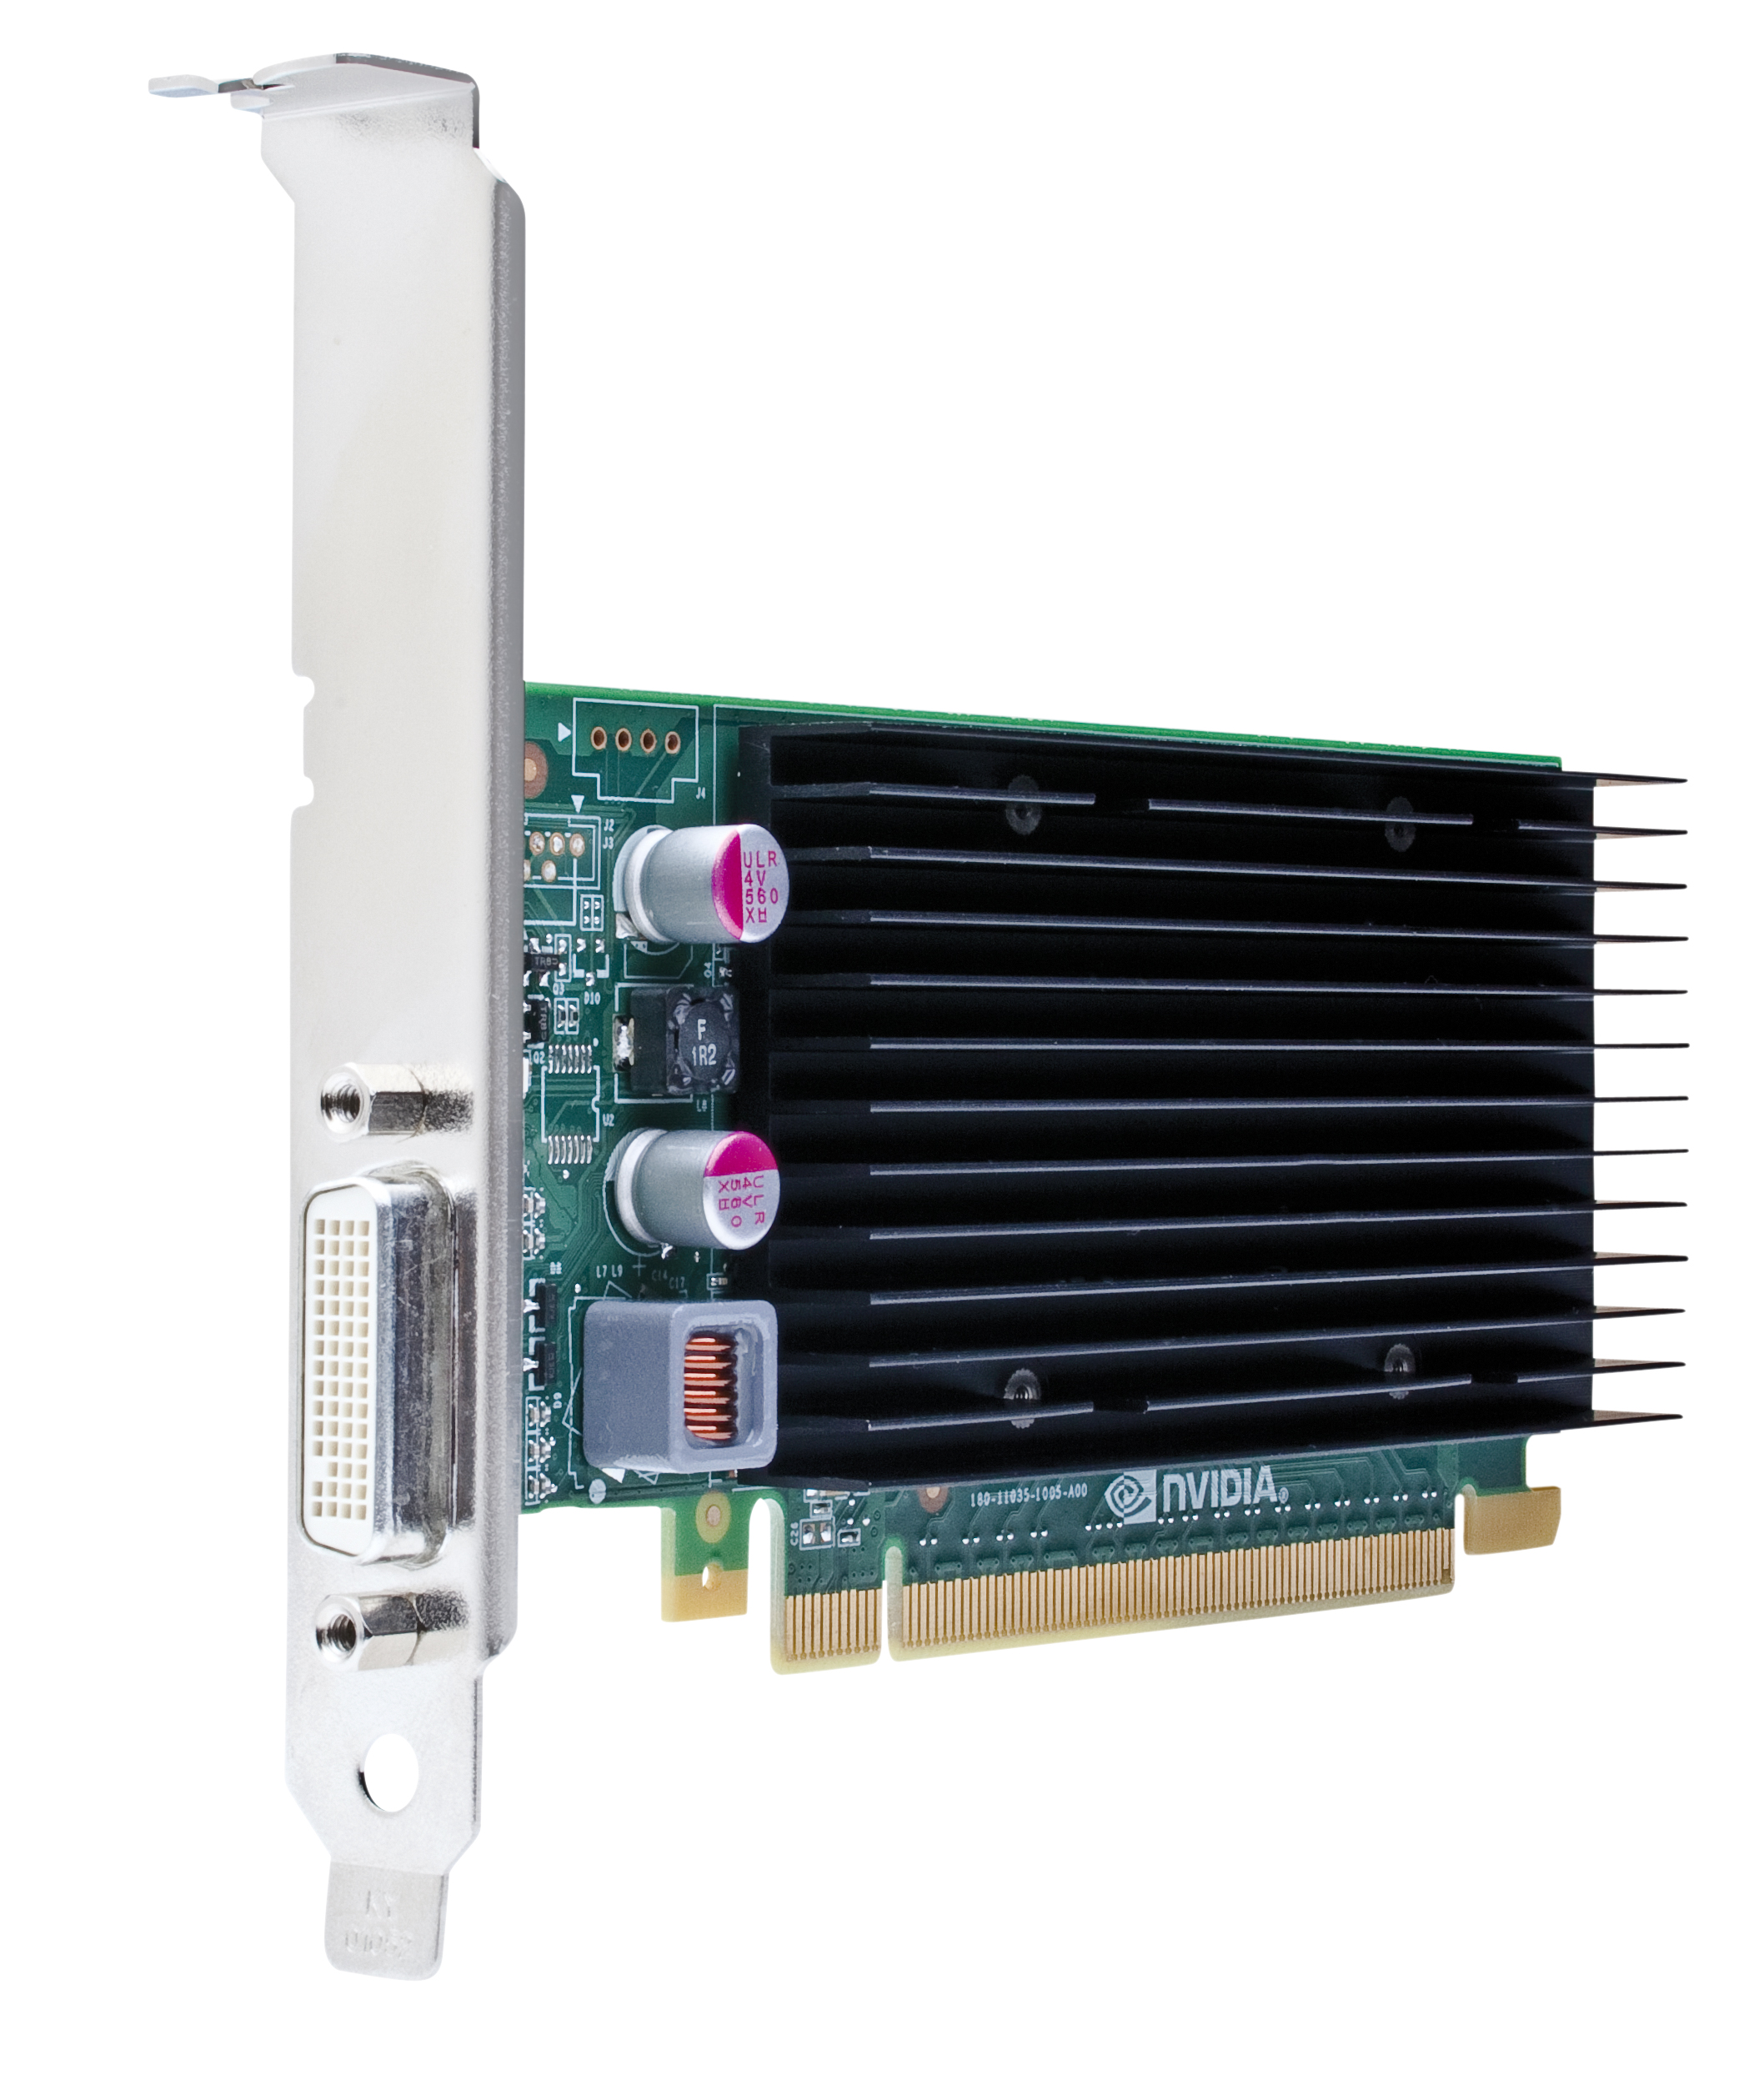 NVIDIA® Quadro® NVS 450 Professional Graphics Solution